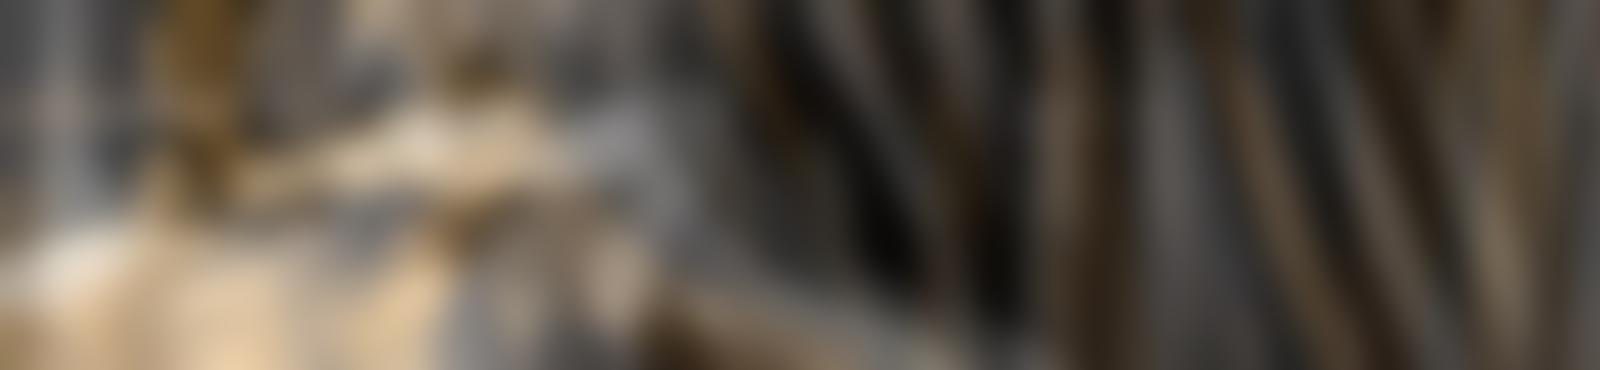 Blurred bacfa394 3a82 4df6 b647 8bde162f6b8b